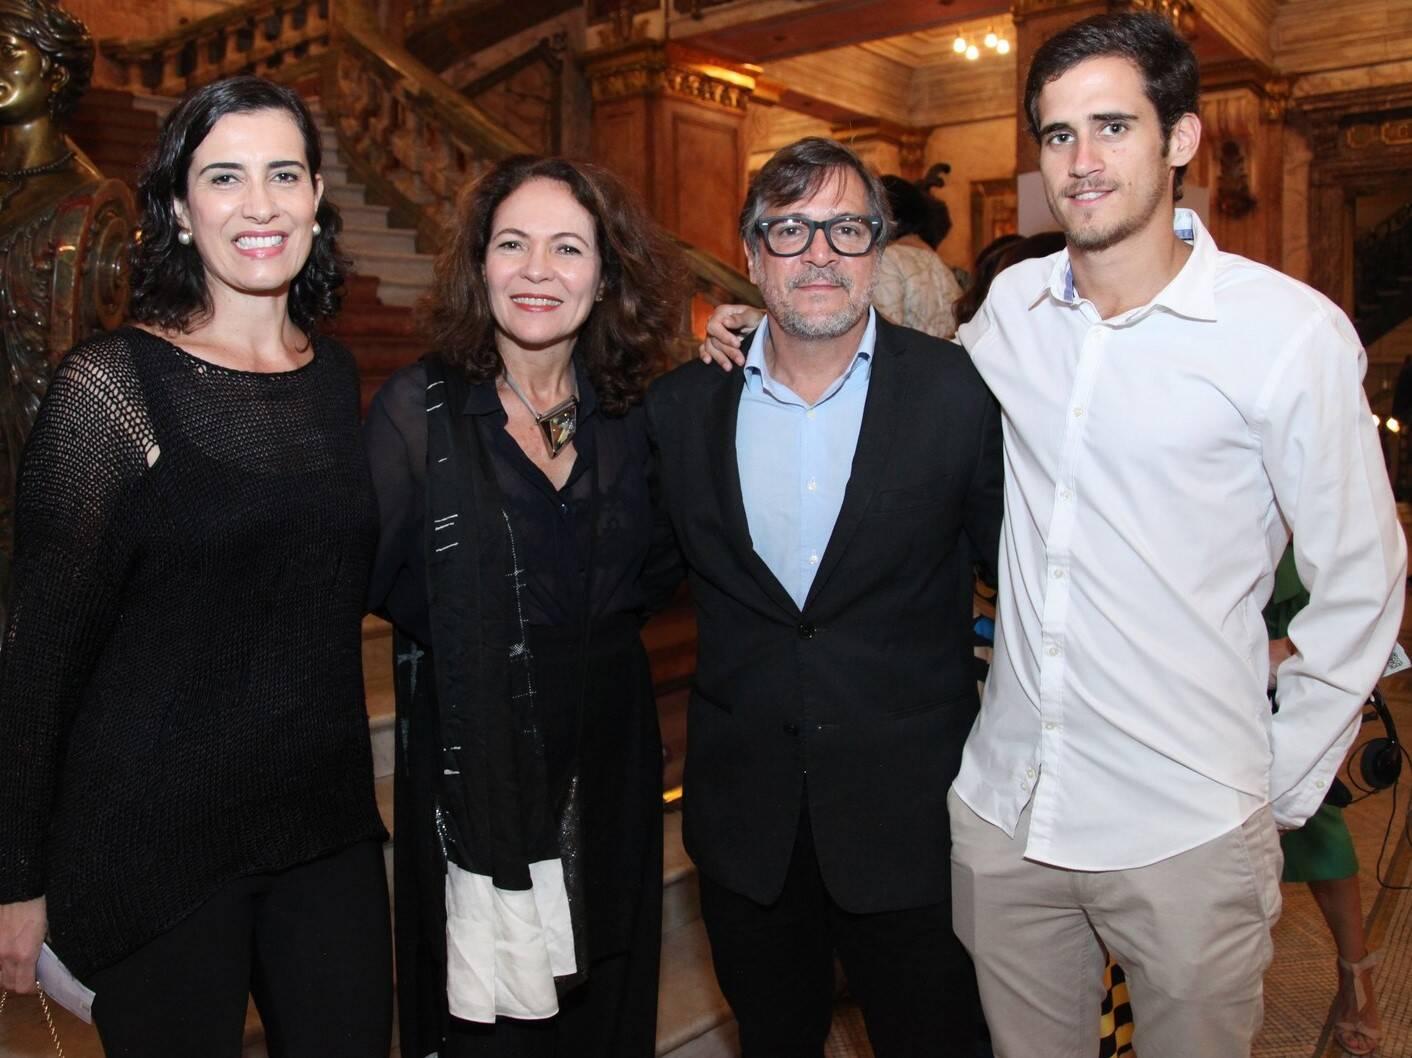 Flávia Manahu , Roberta Damasceno, Paquito e Pedro Lucas /Foto: Vera Donato